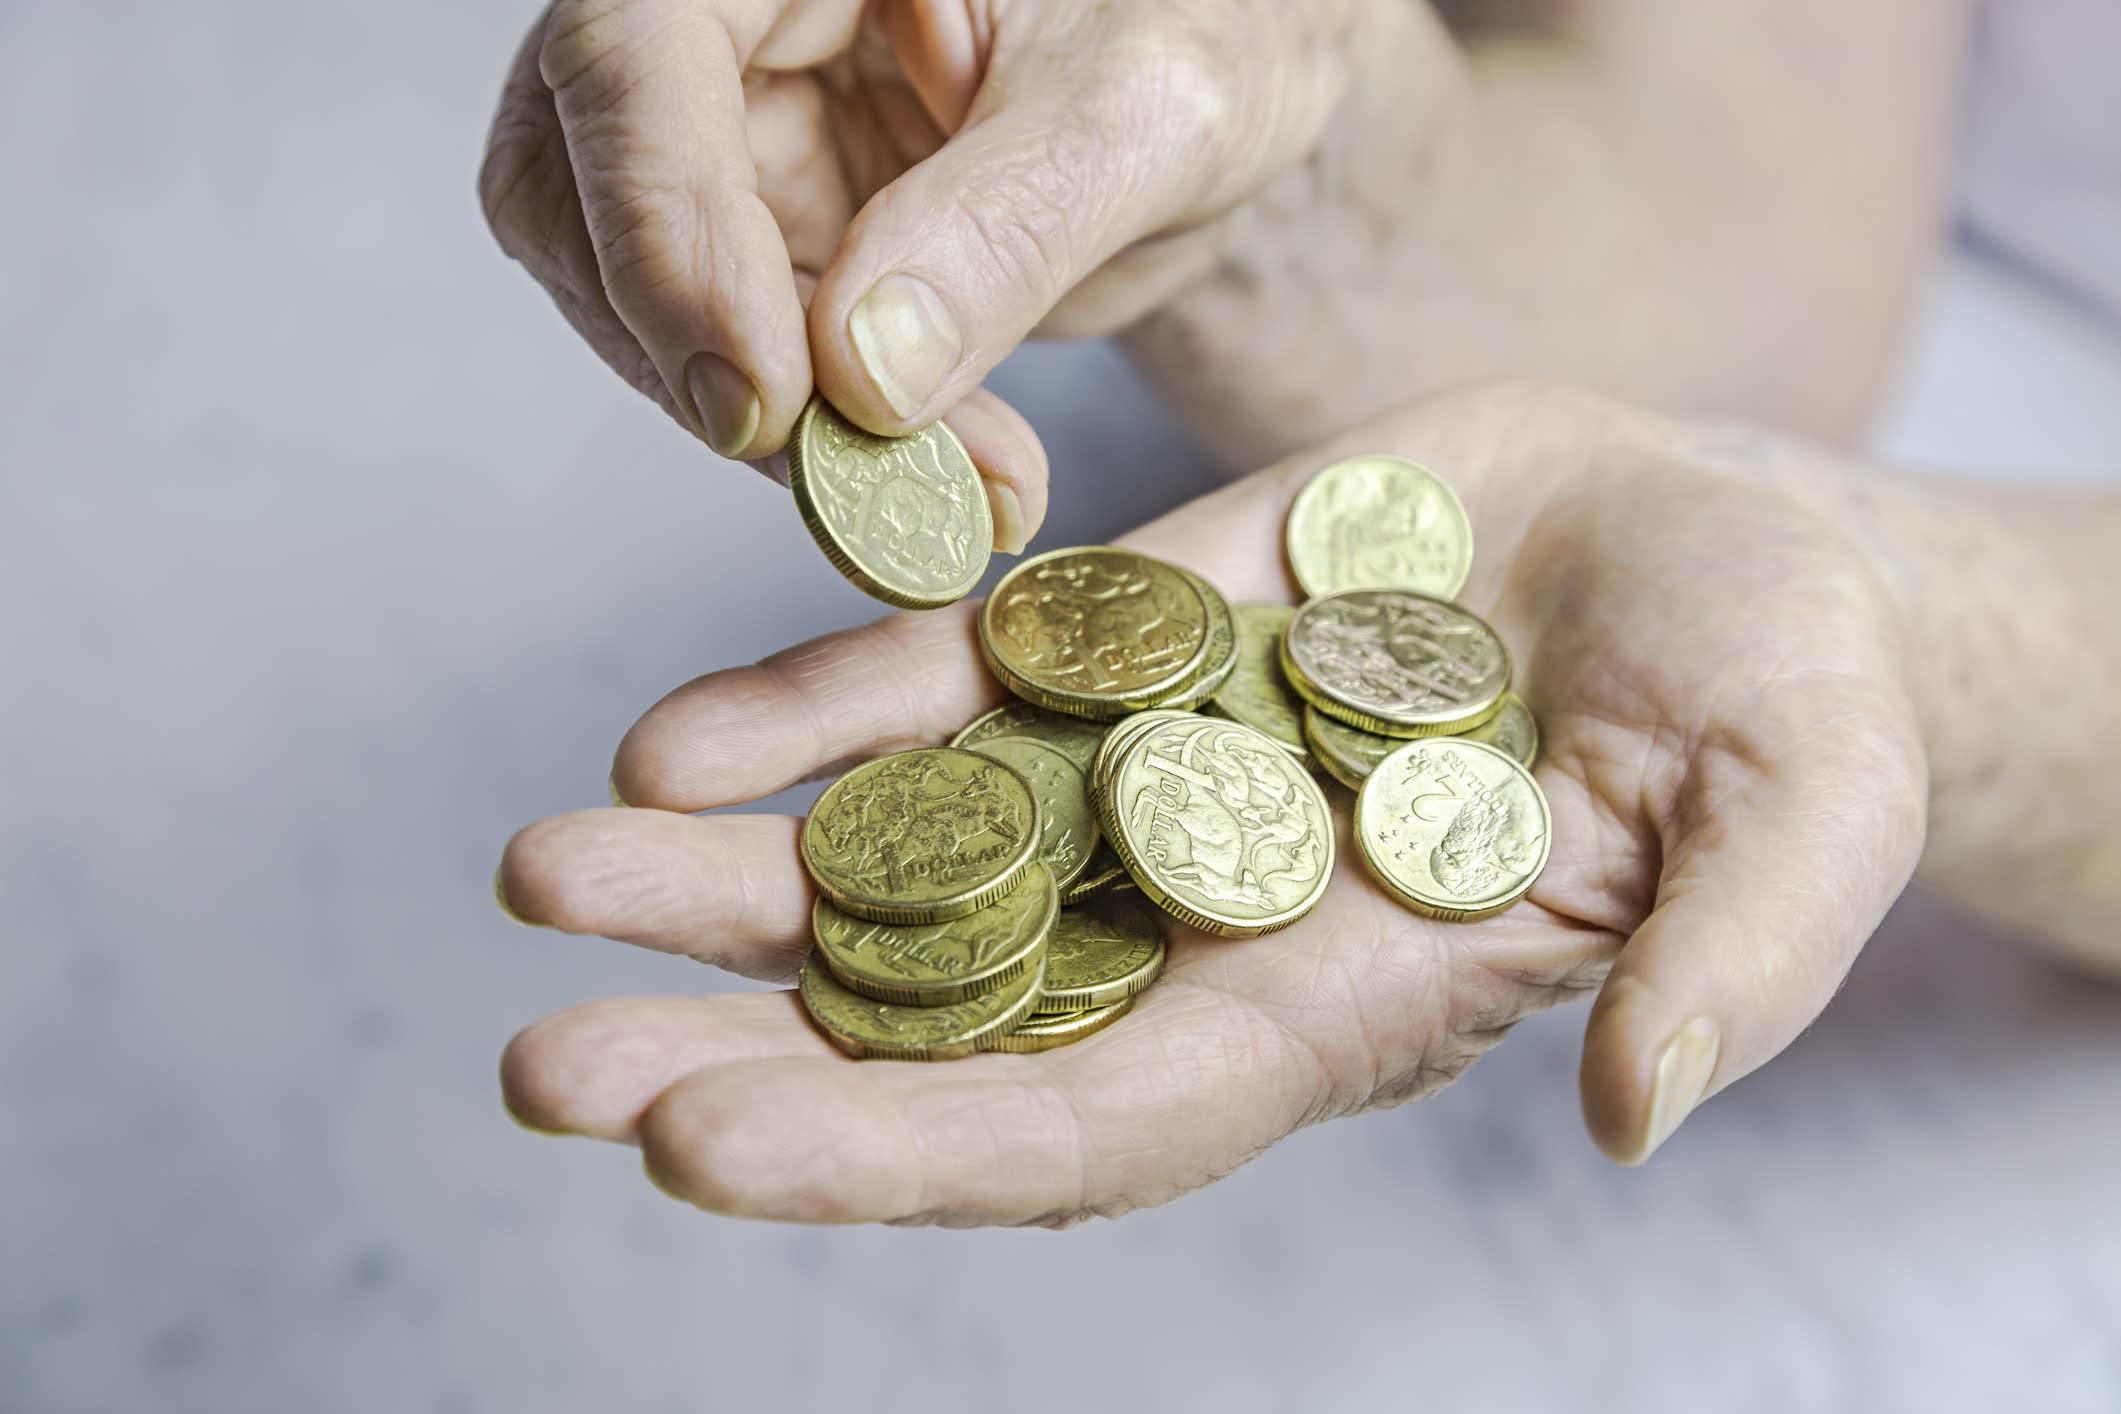 6 ways Reddit users would make the most of Australia's terrible economy - Yahoo Finance Australia